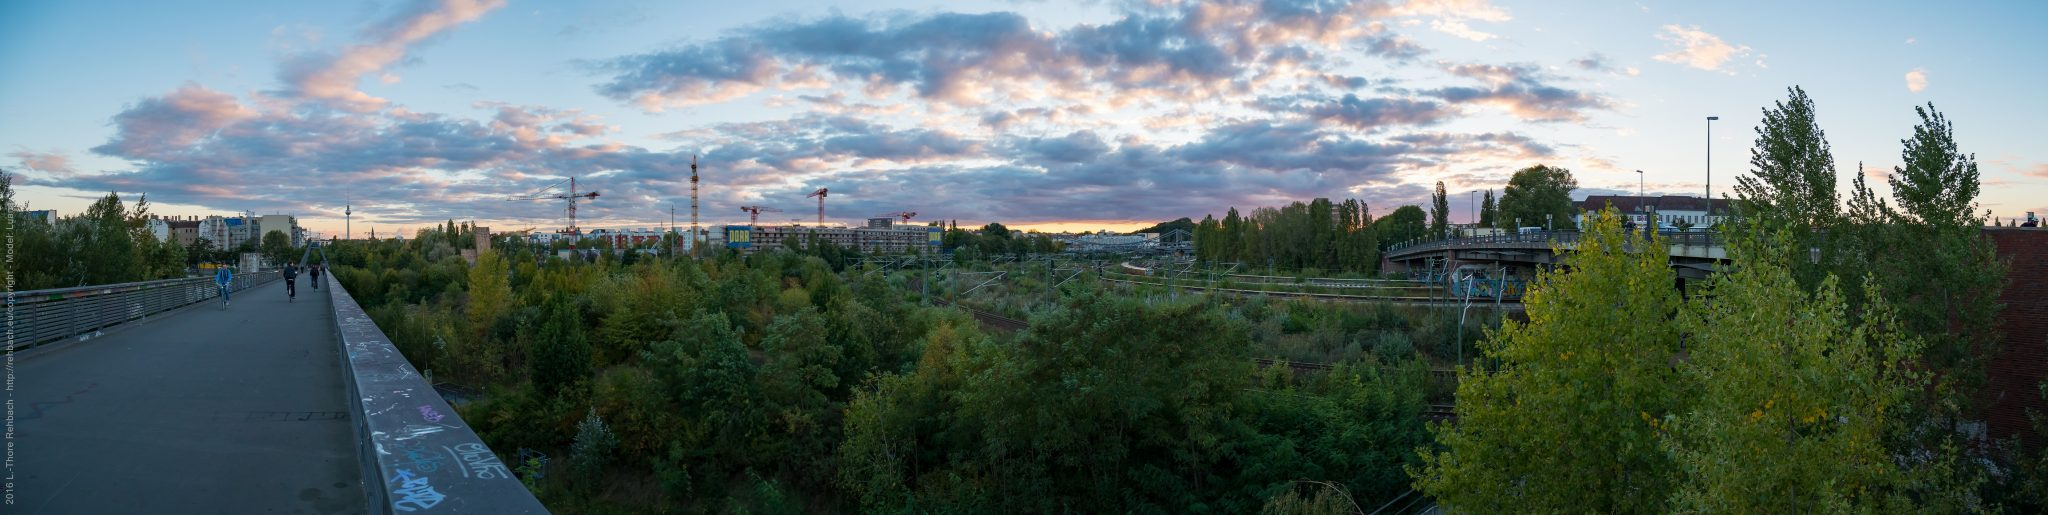 Mein Kiez – ein Panorama